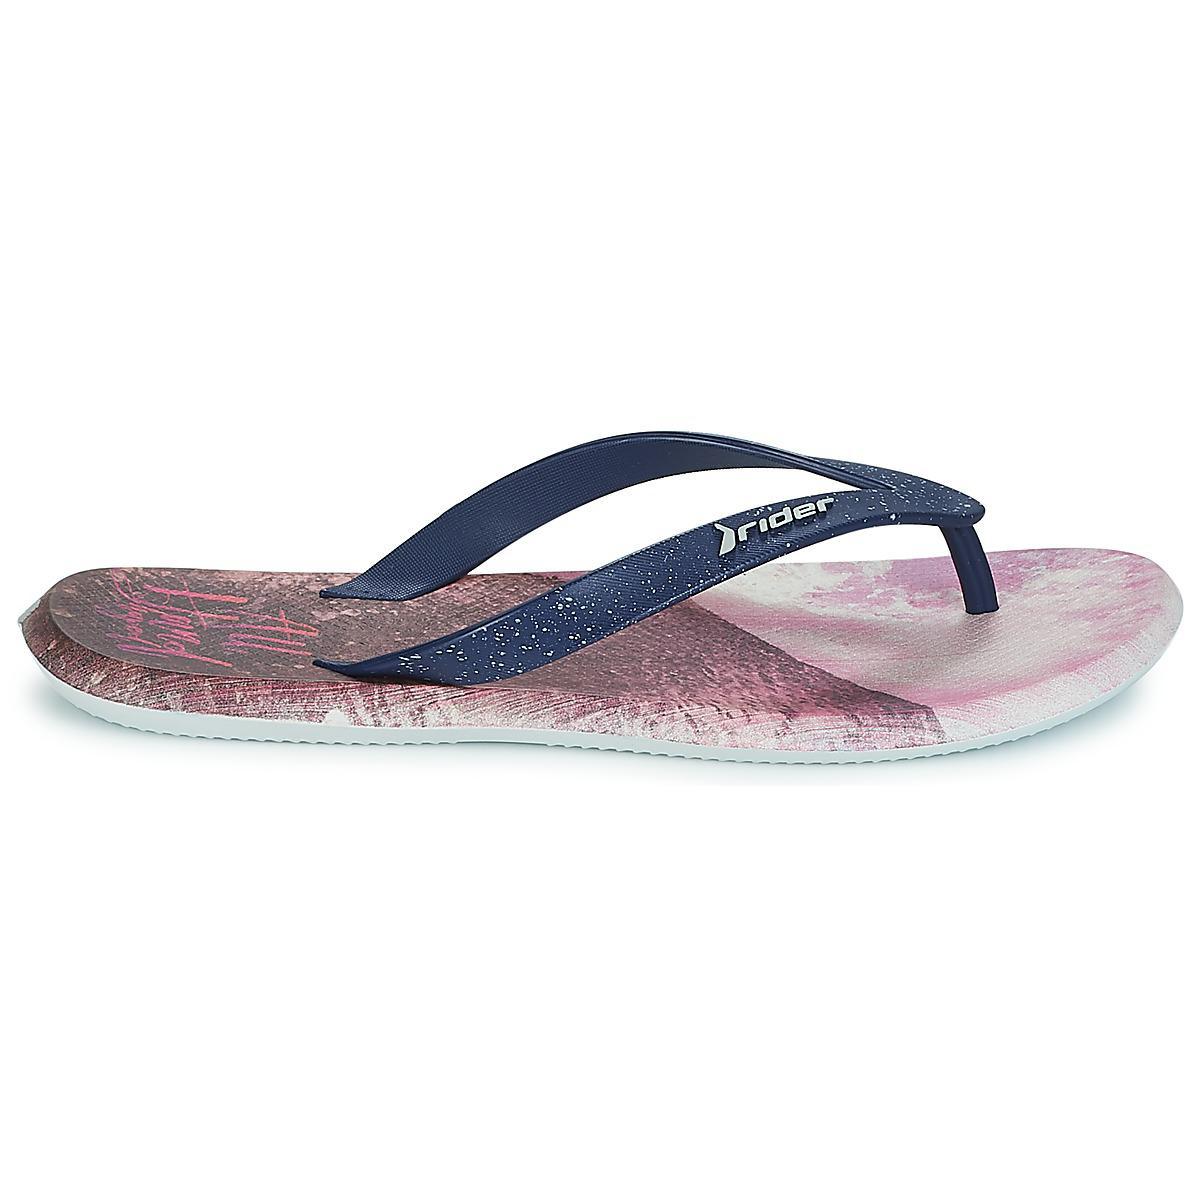 76e90dbcebf4c9 Rider - Blue R1 Energy Ad Homme Flip Flops   Sandals (shoes) for Men. View  fullscreen